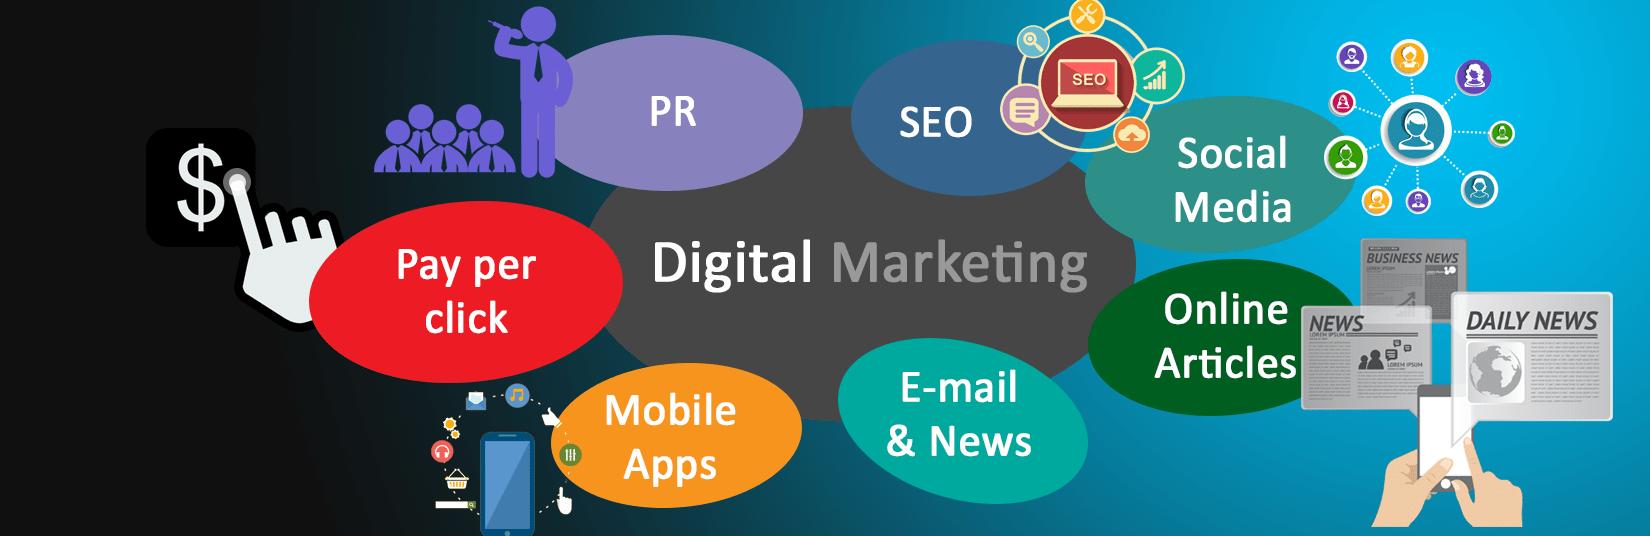 kursus digital marketing jogja berpengalaman